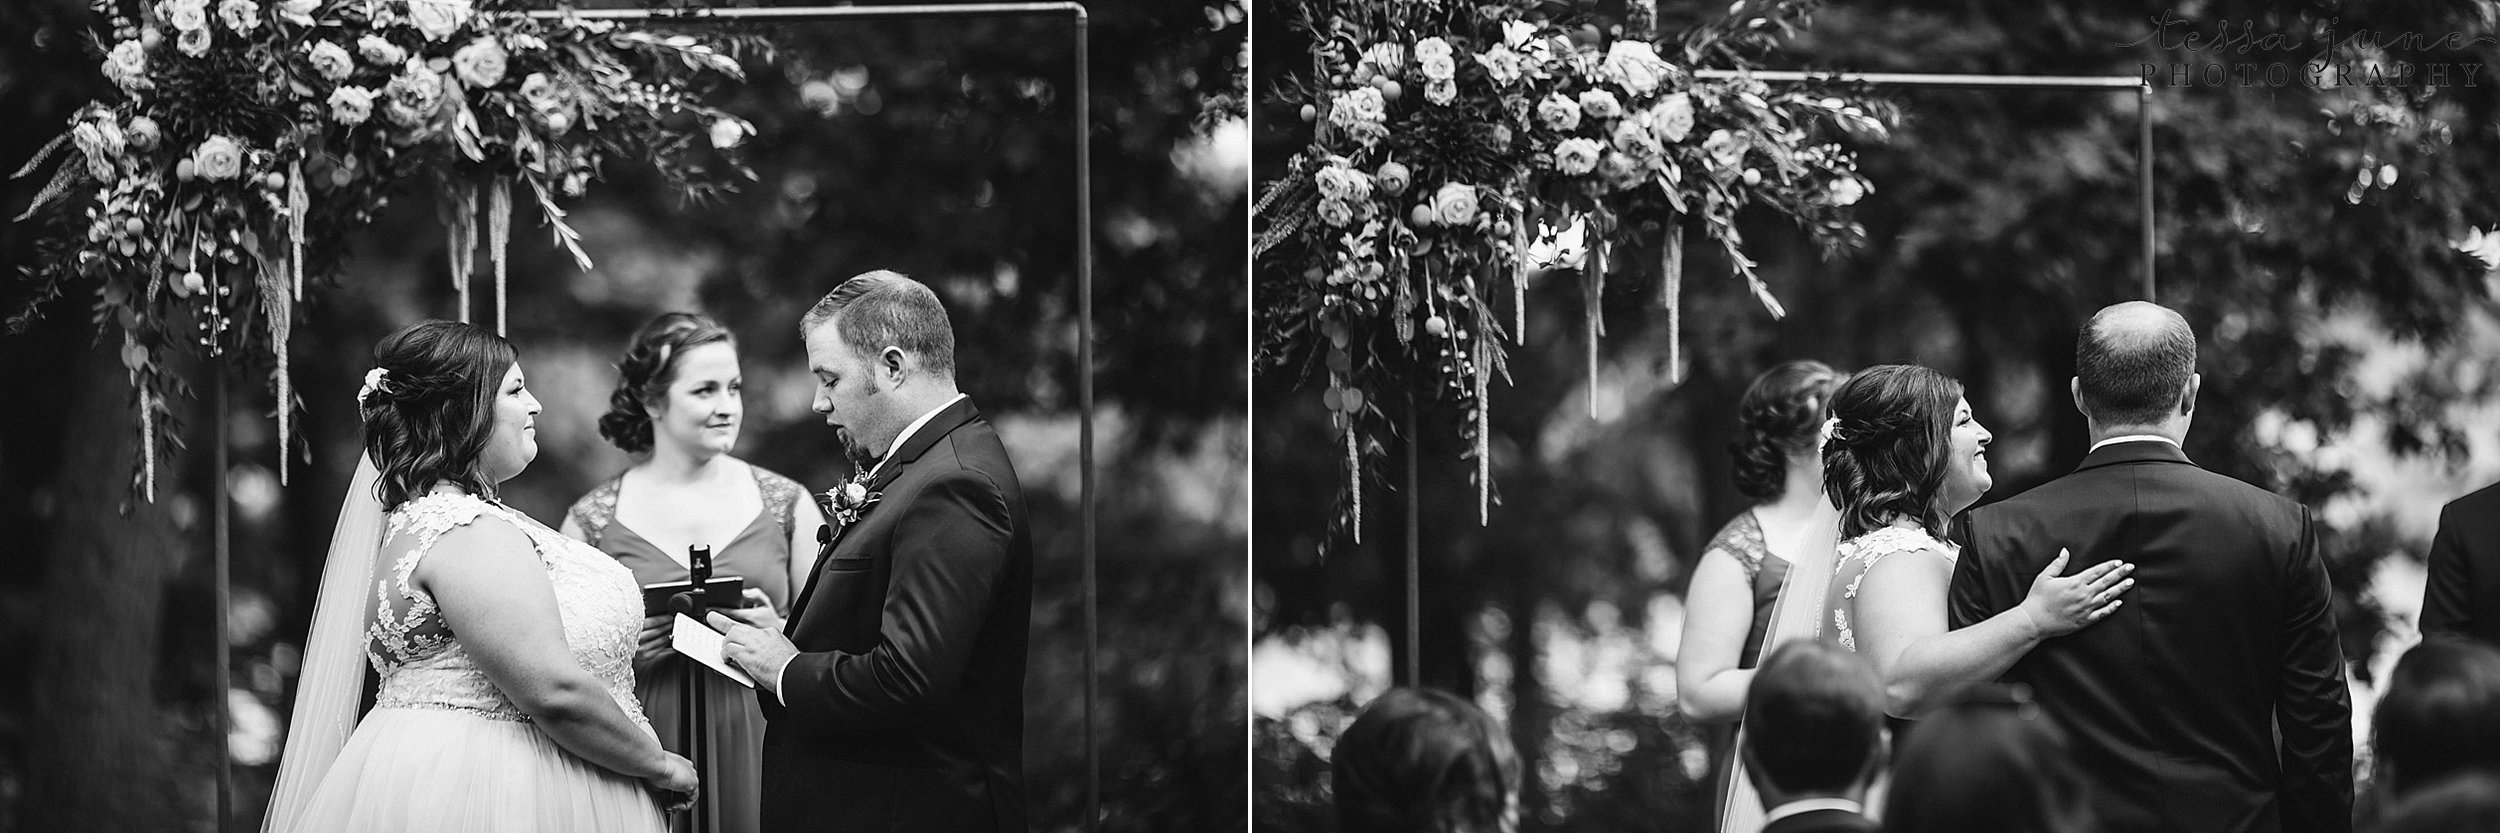 minneapolis-summer-wedding-at-silverwood-park-pristine-floral-100.jpg